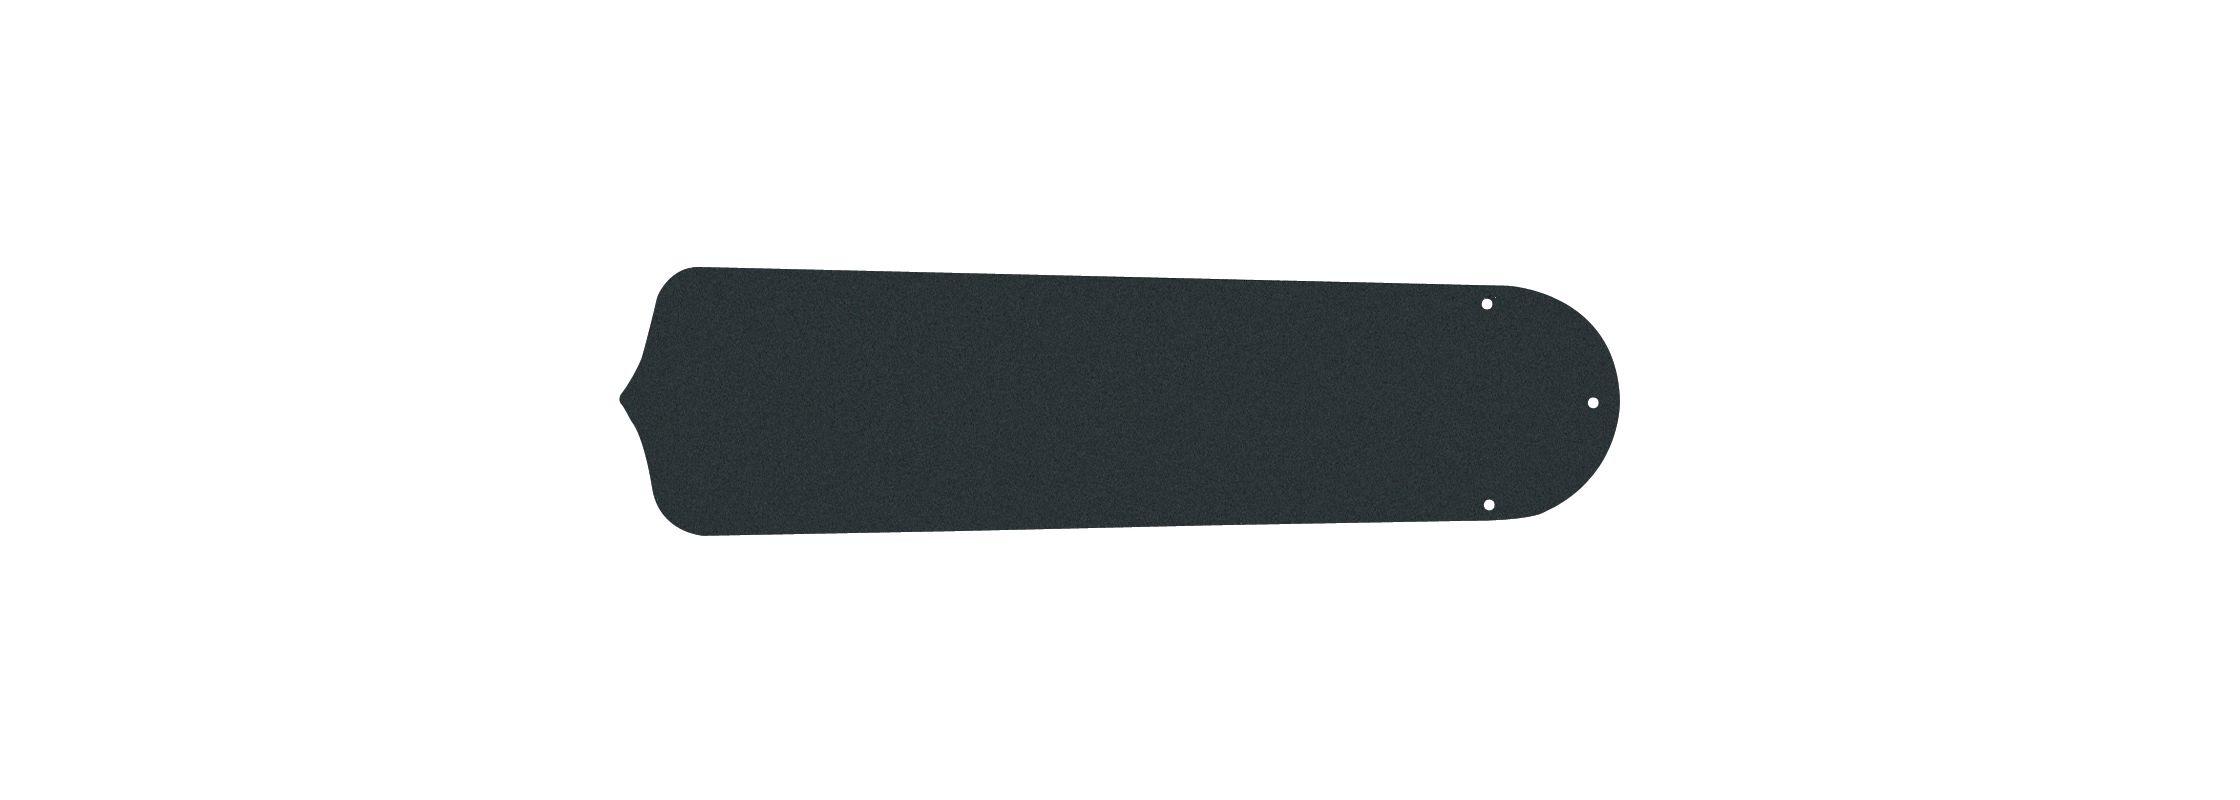 "Craftmade B552S Custom Wood 52"" (Pack of 5) Flat Black Ceiling Fan"